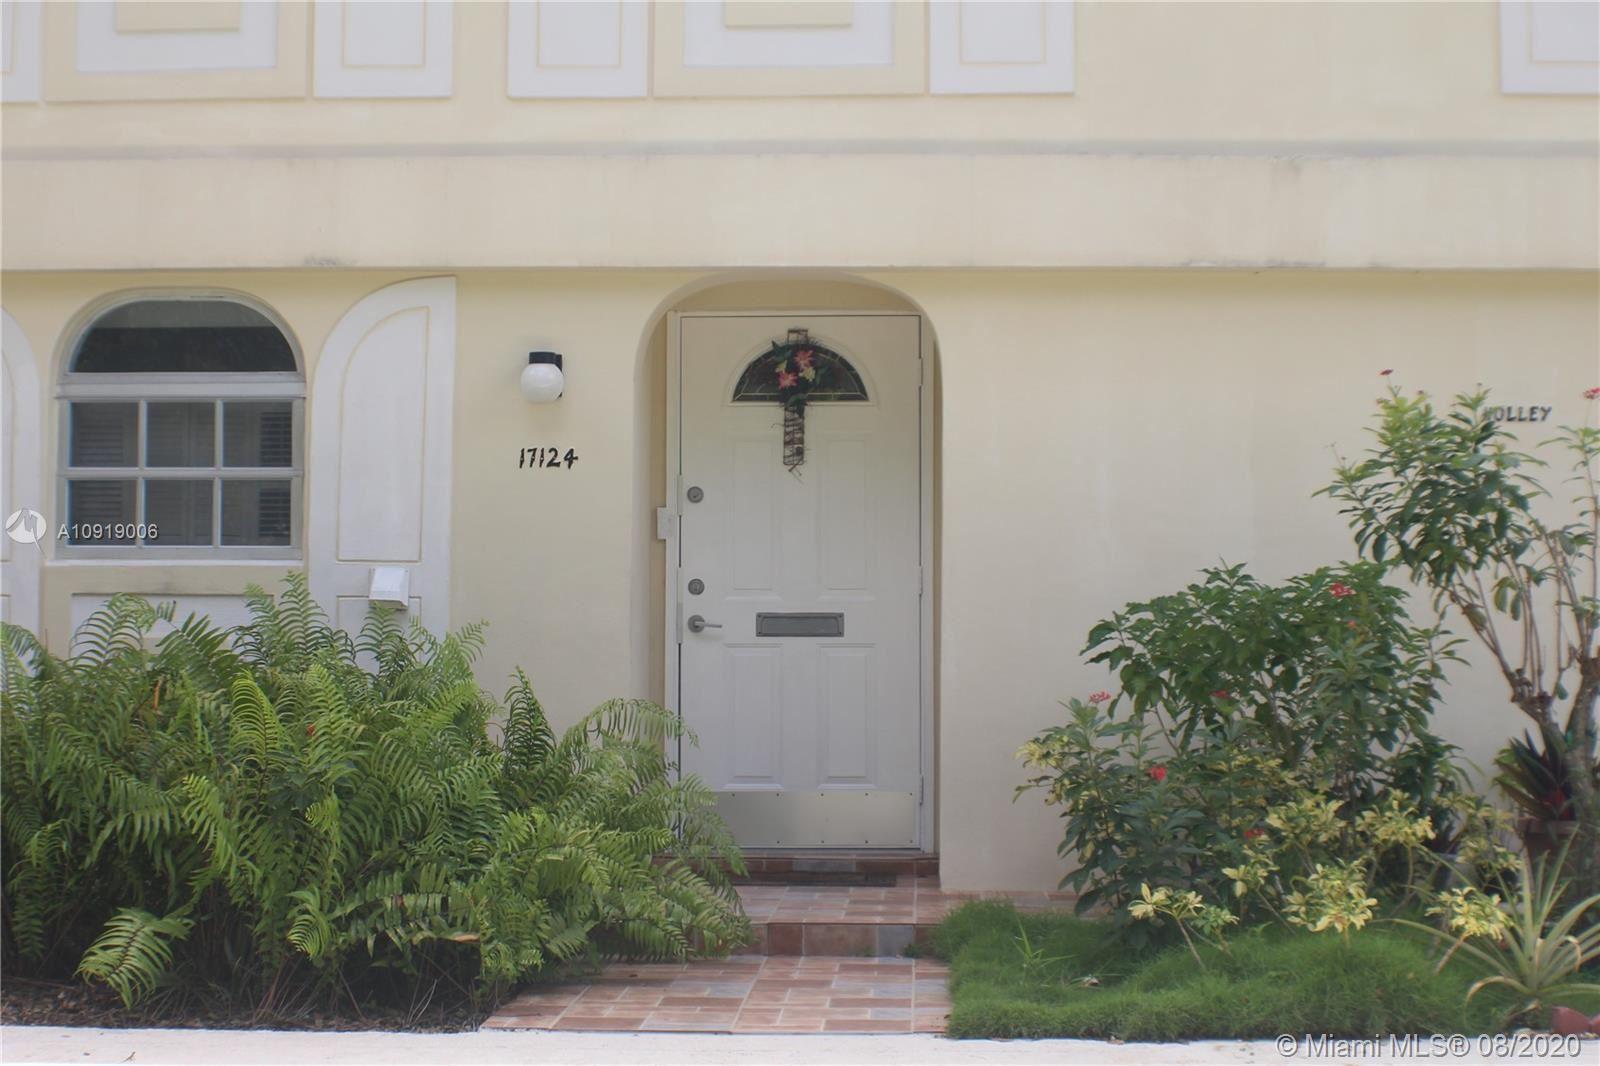 17124 SW 112 Court #I1242b, West Perrine, FL 33157 - #: A10919006